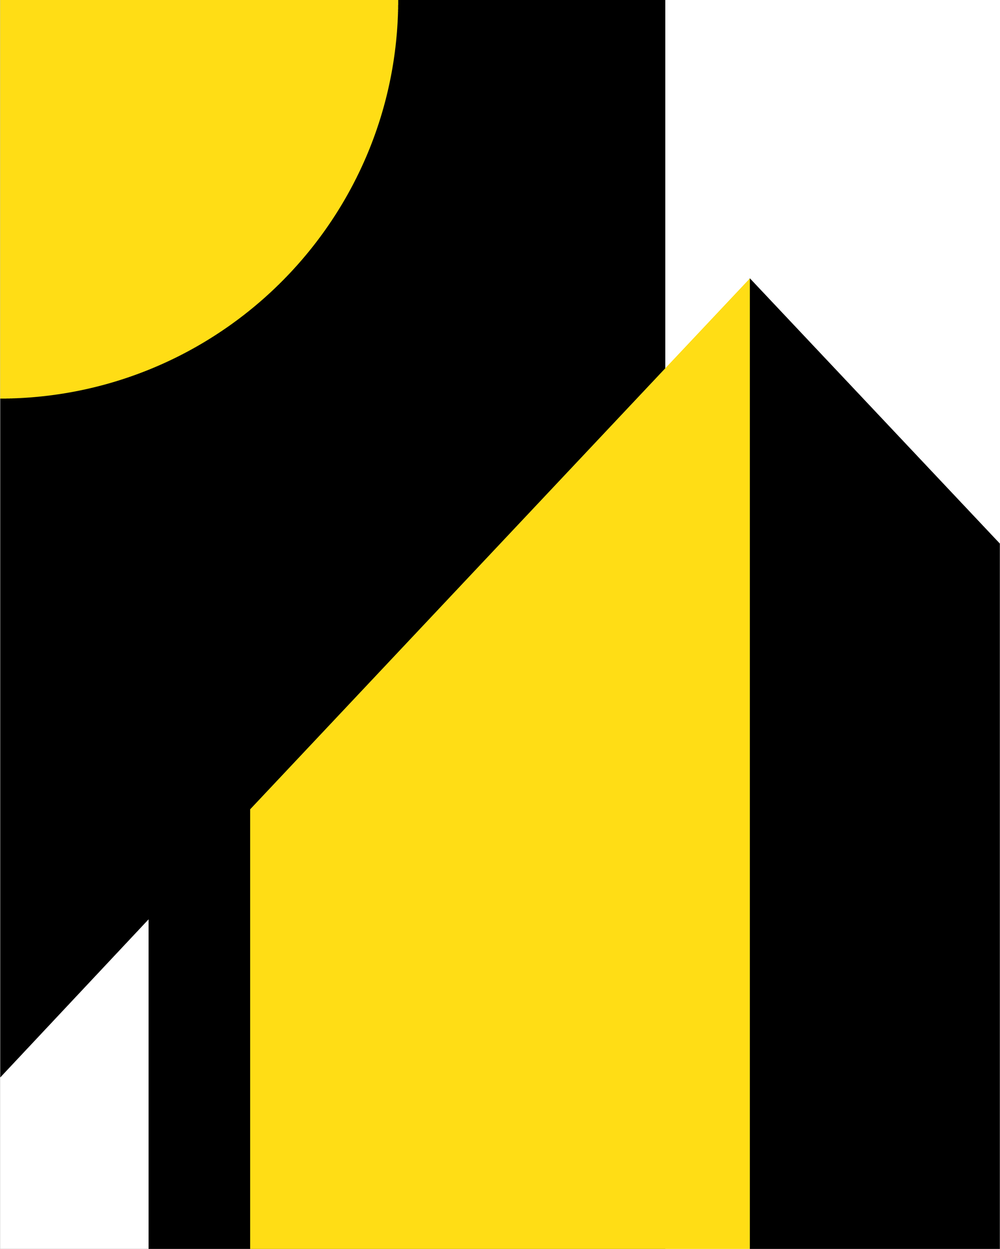 alexa-wright-graphic-yellow.png